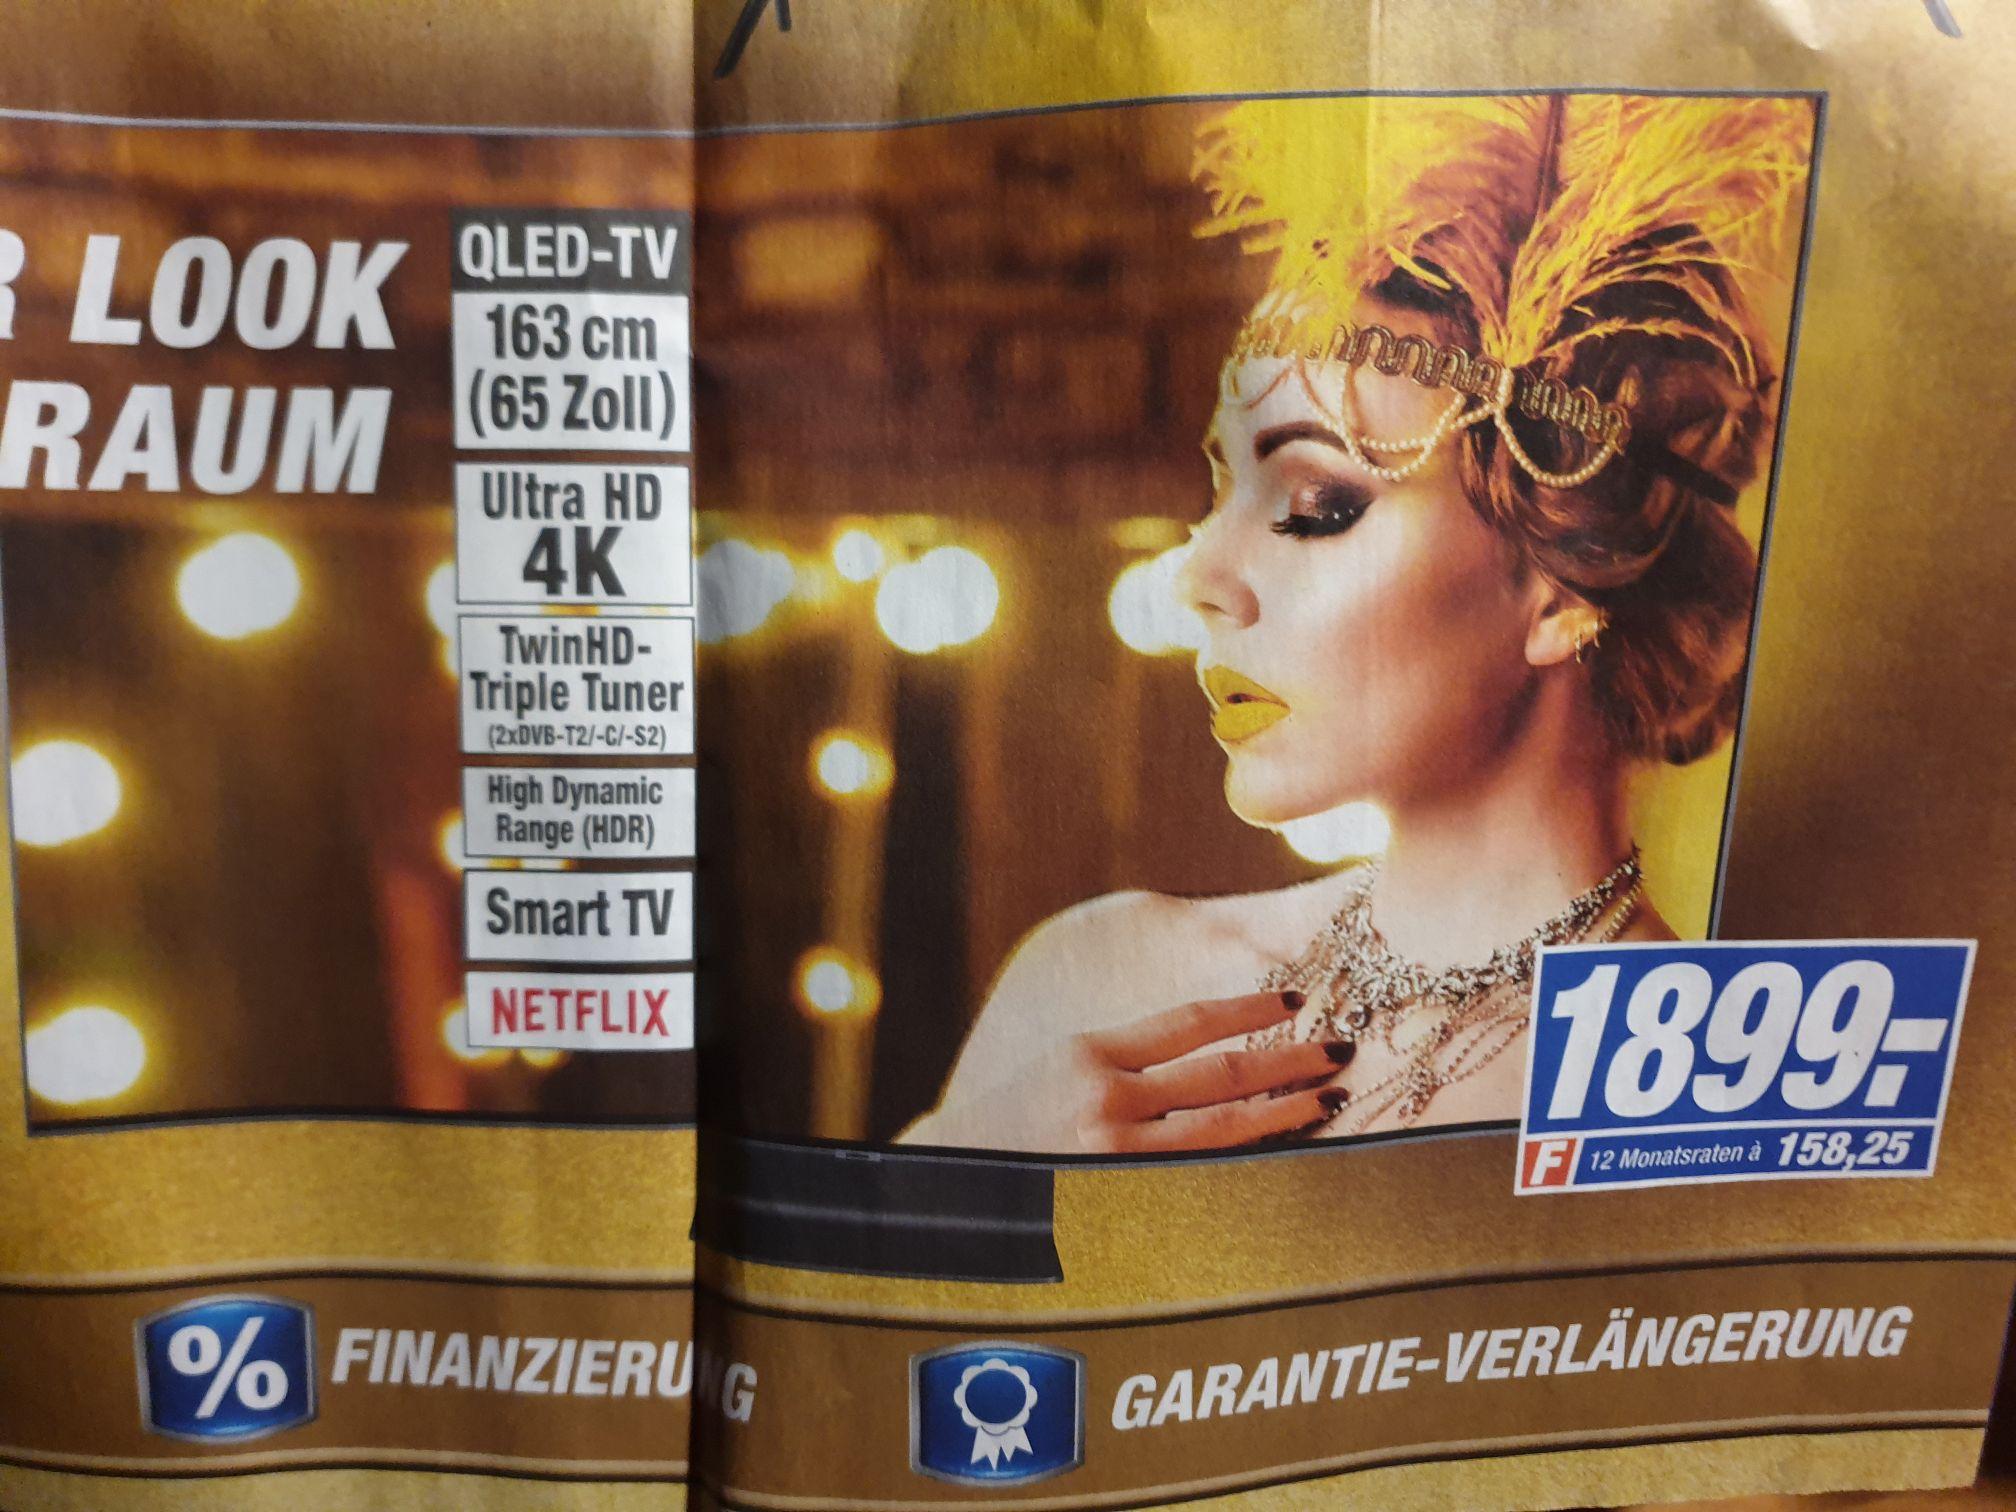 (Lokal Bielefeld) Samsung Qled GQ65Q90R Premium-Fernseher 65 Zoll, 4K,One-Connect-Box usw. nur 1899€